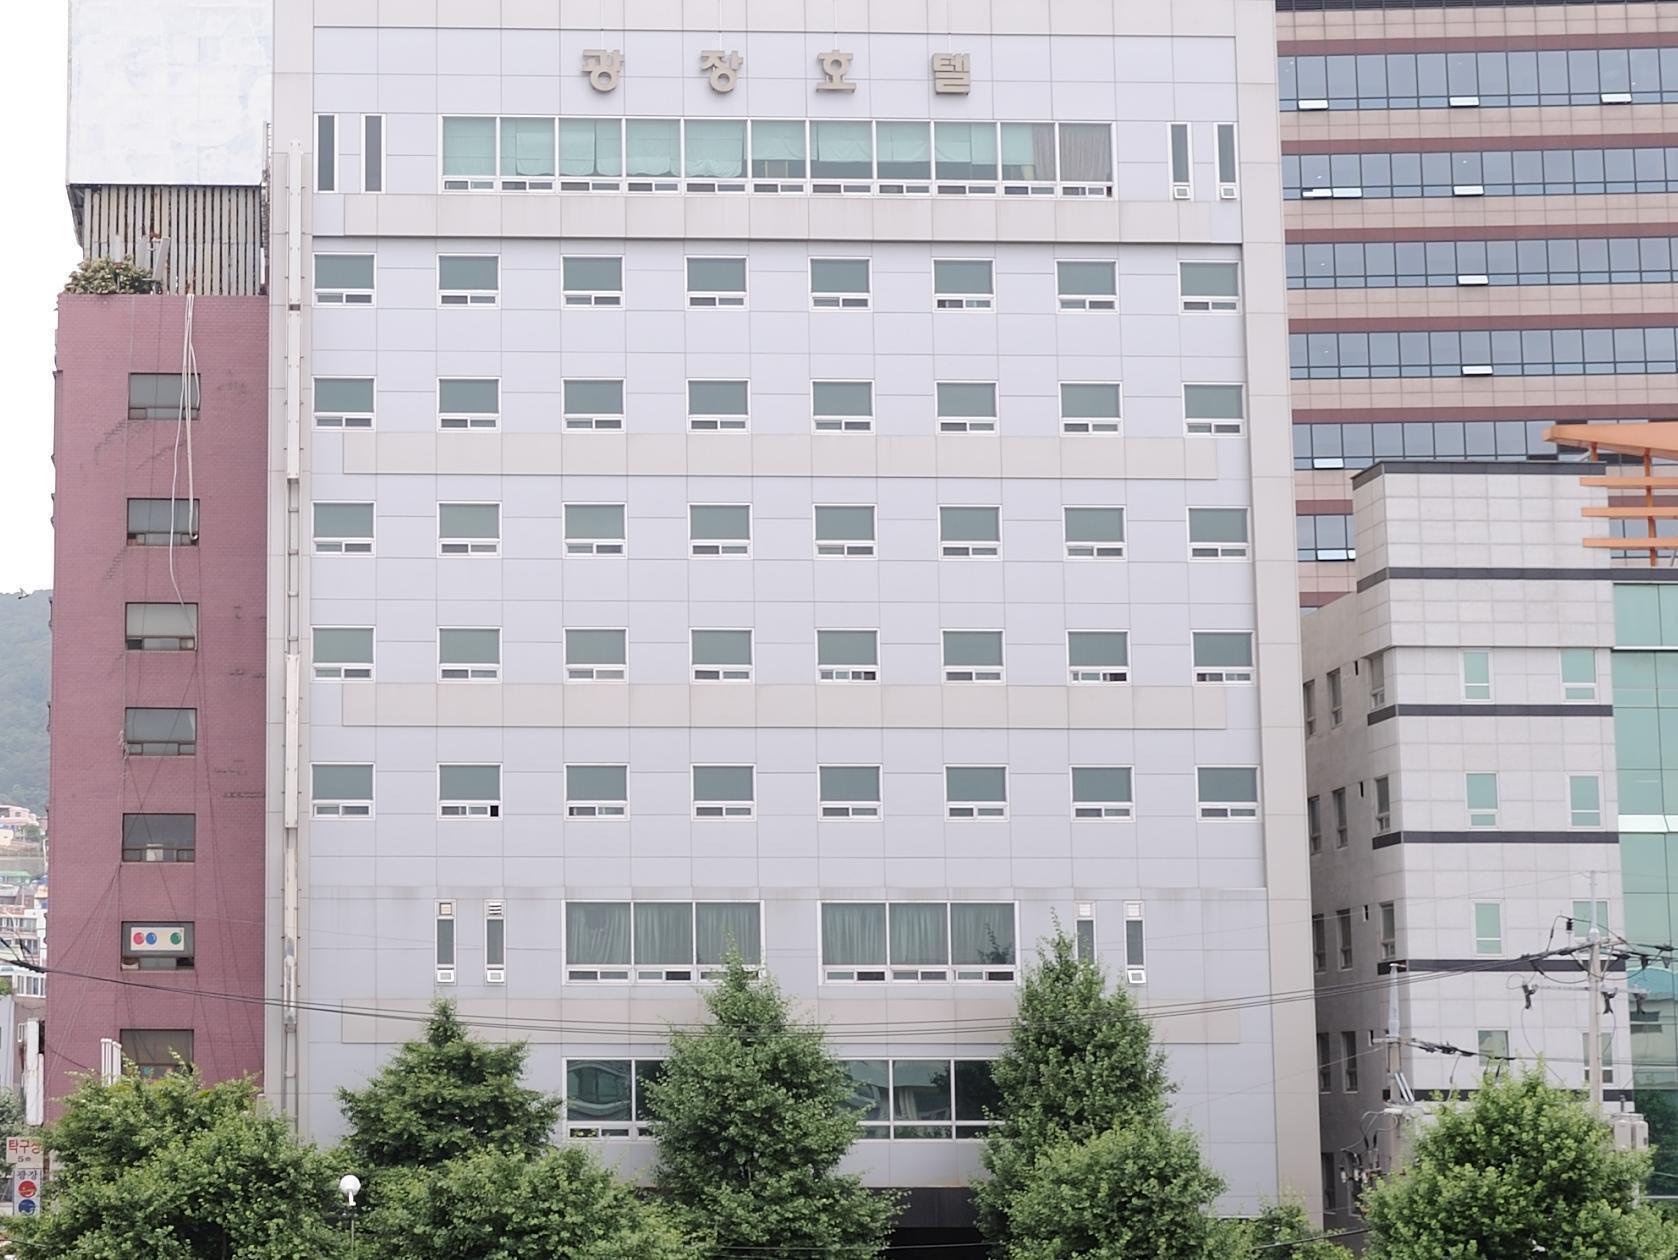 Hotel Gwang Jang - Hotels and Accommodation in South Korea, Asia